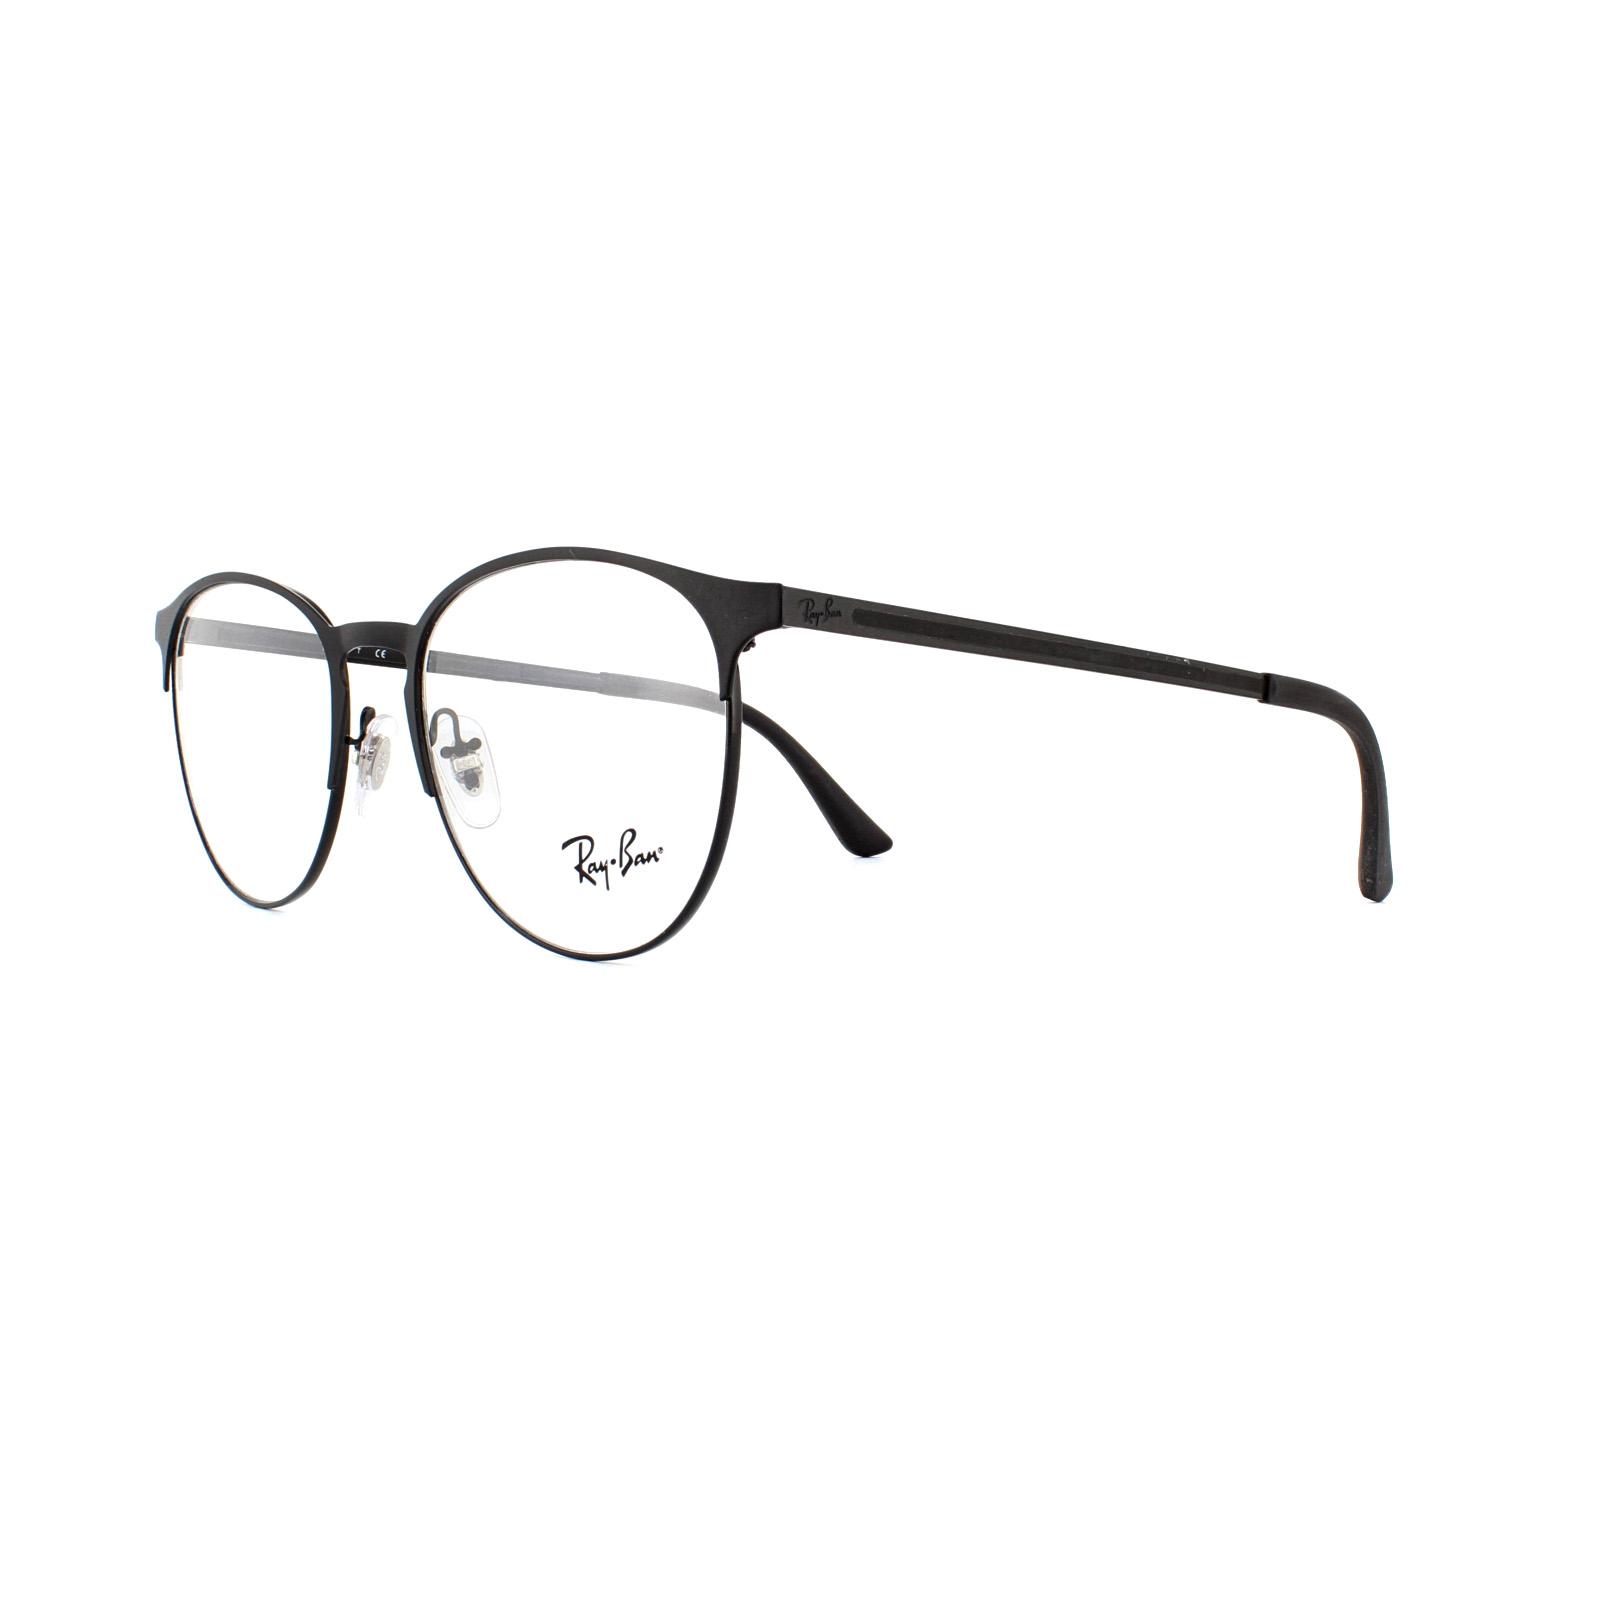 5e183b5097f Ray-Ban Glasses Frames 6375 2944 Black 51mm 8053672767889